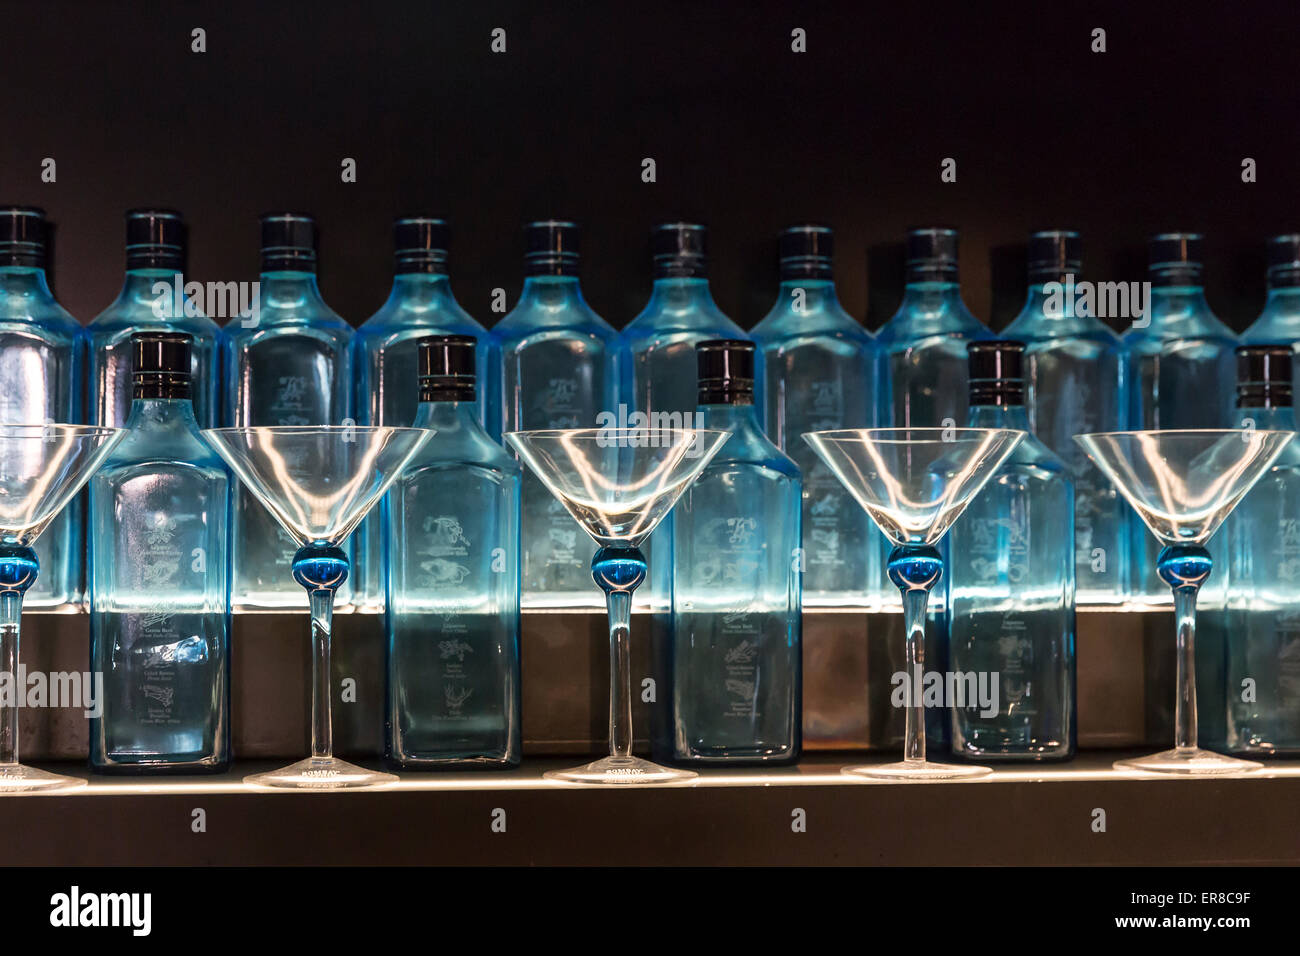 Gin shop, Bombay Sapphire Distillery Visitor Centre, Laverstoke, Hampshire, England, UK. - Stock Image